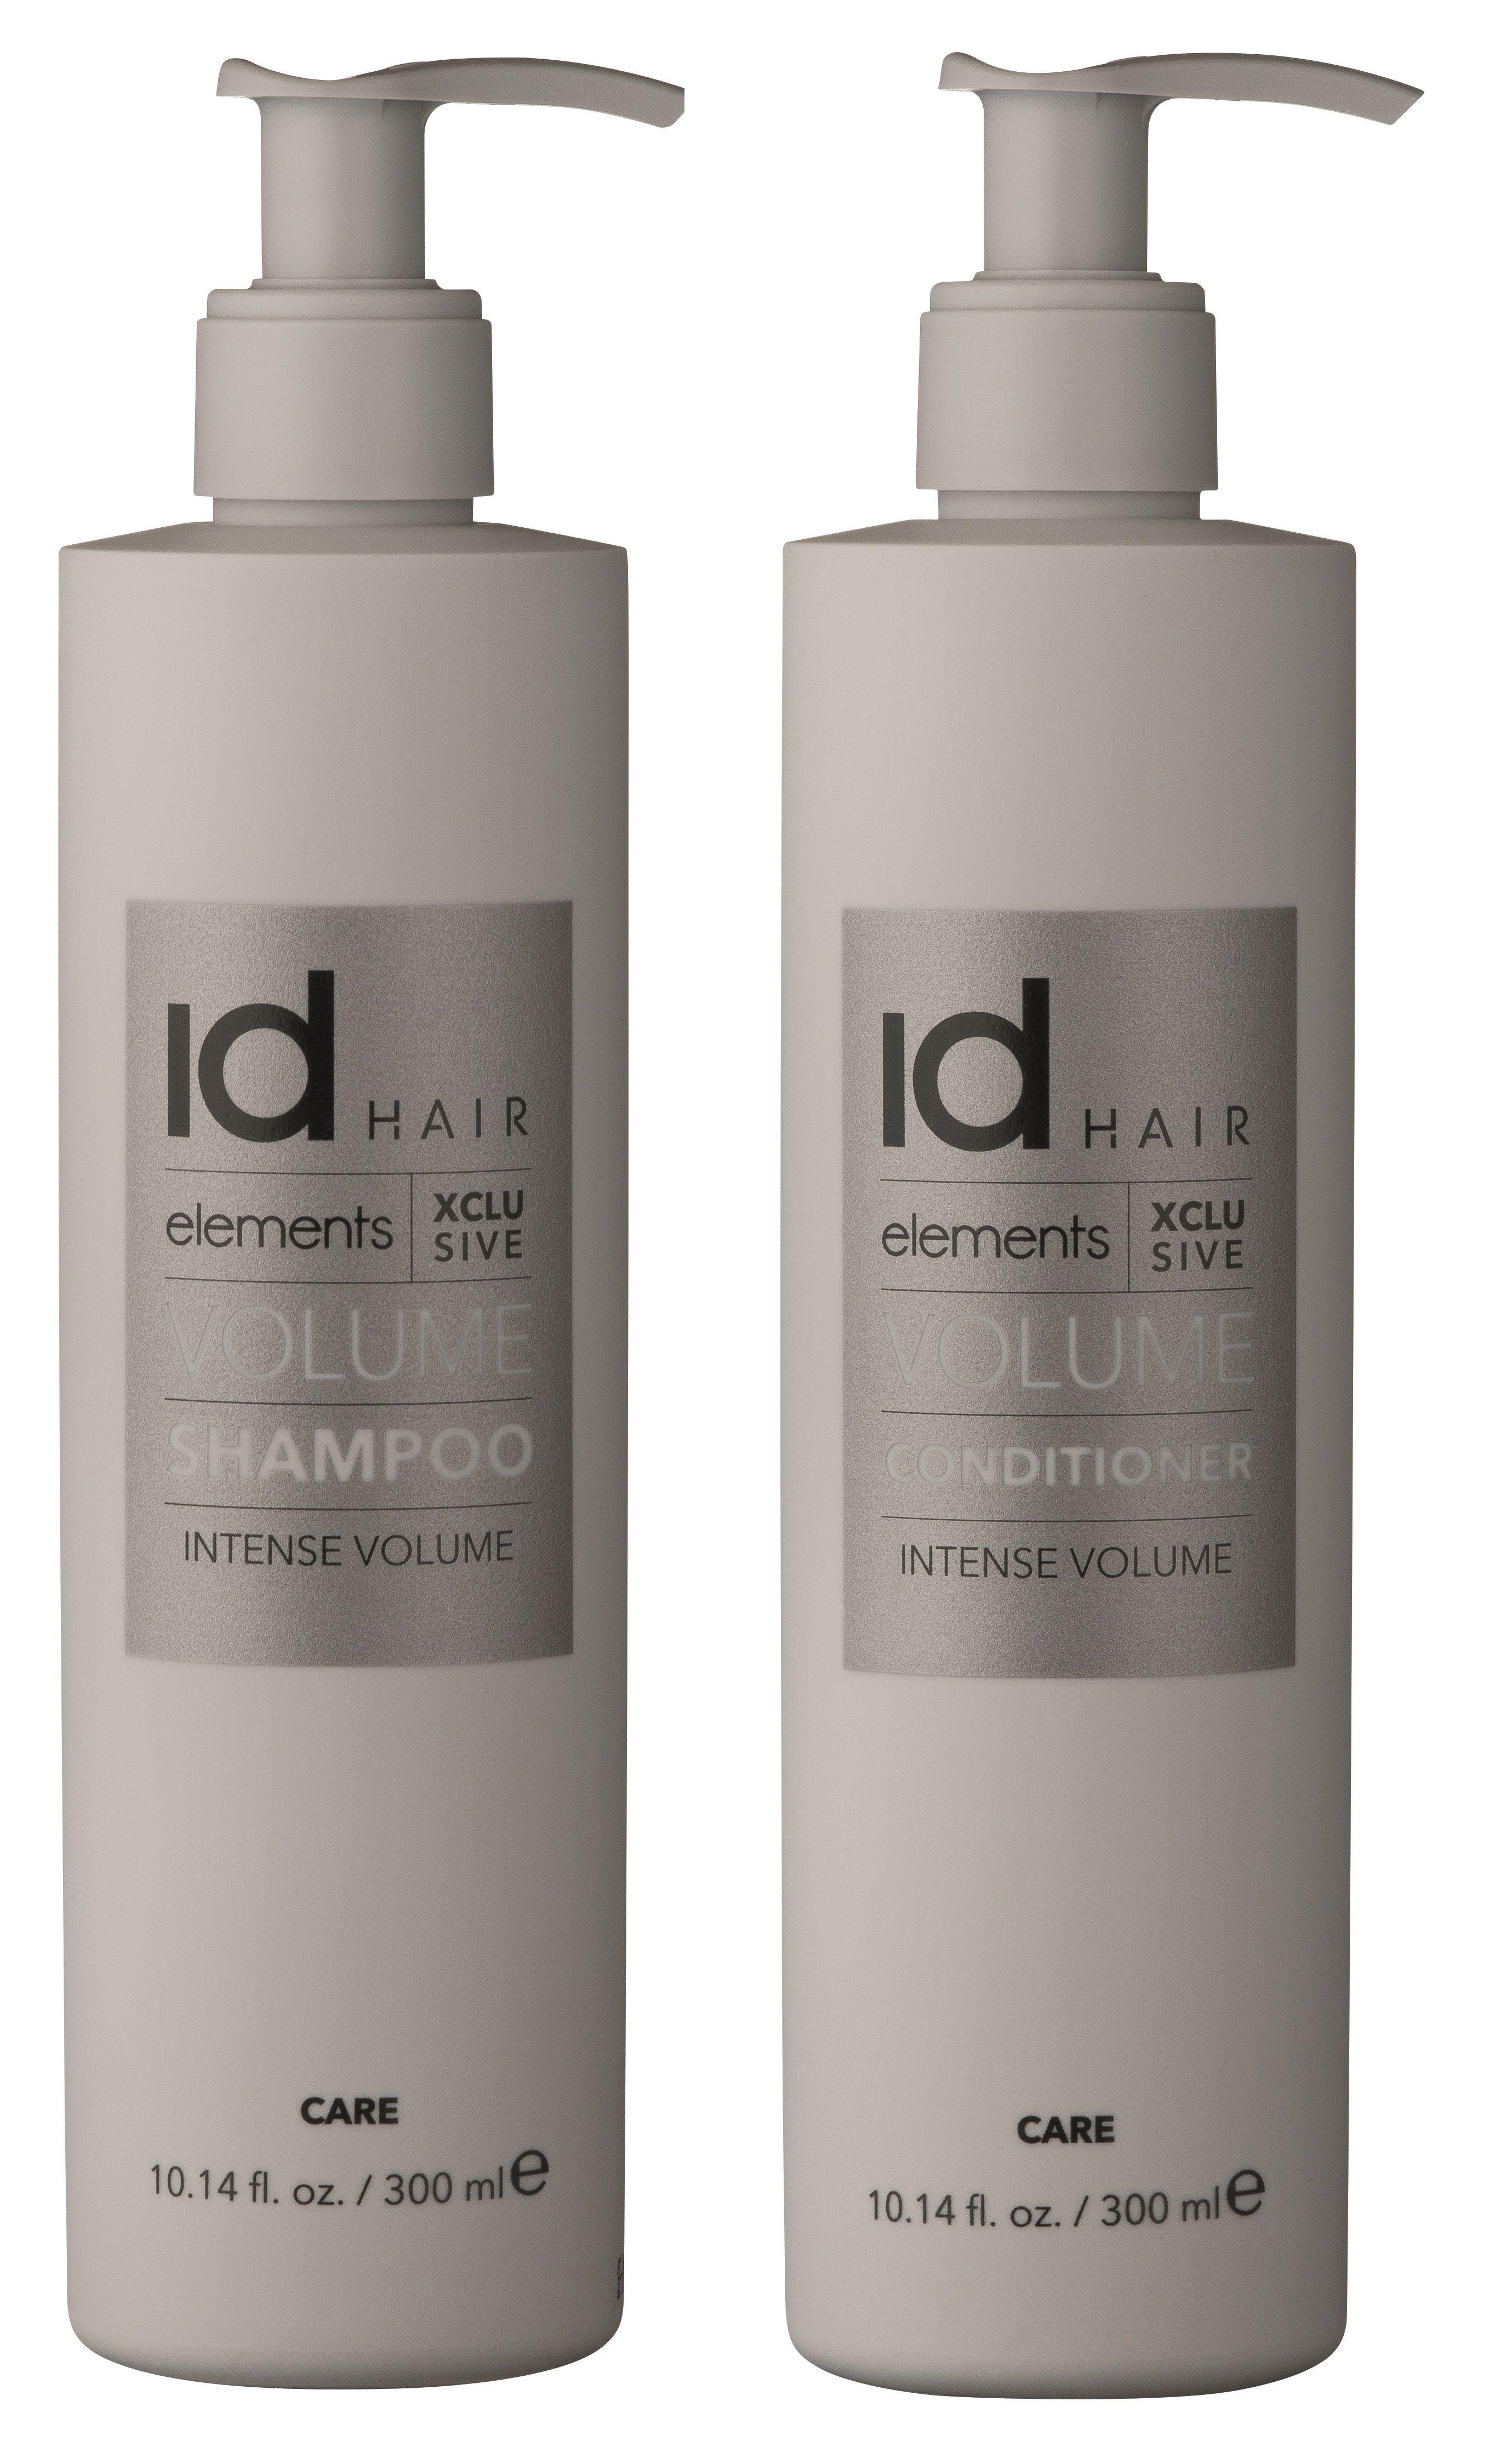 IdHAIR - Elements Xclusive Volume Shampoo 300 ml + Conditioner 300 ml